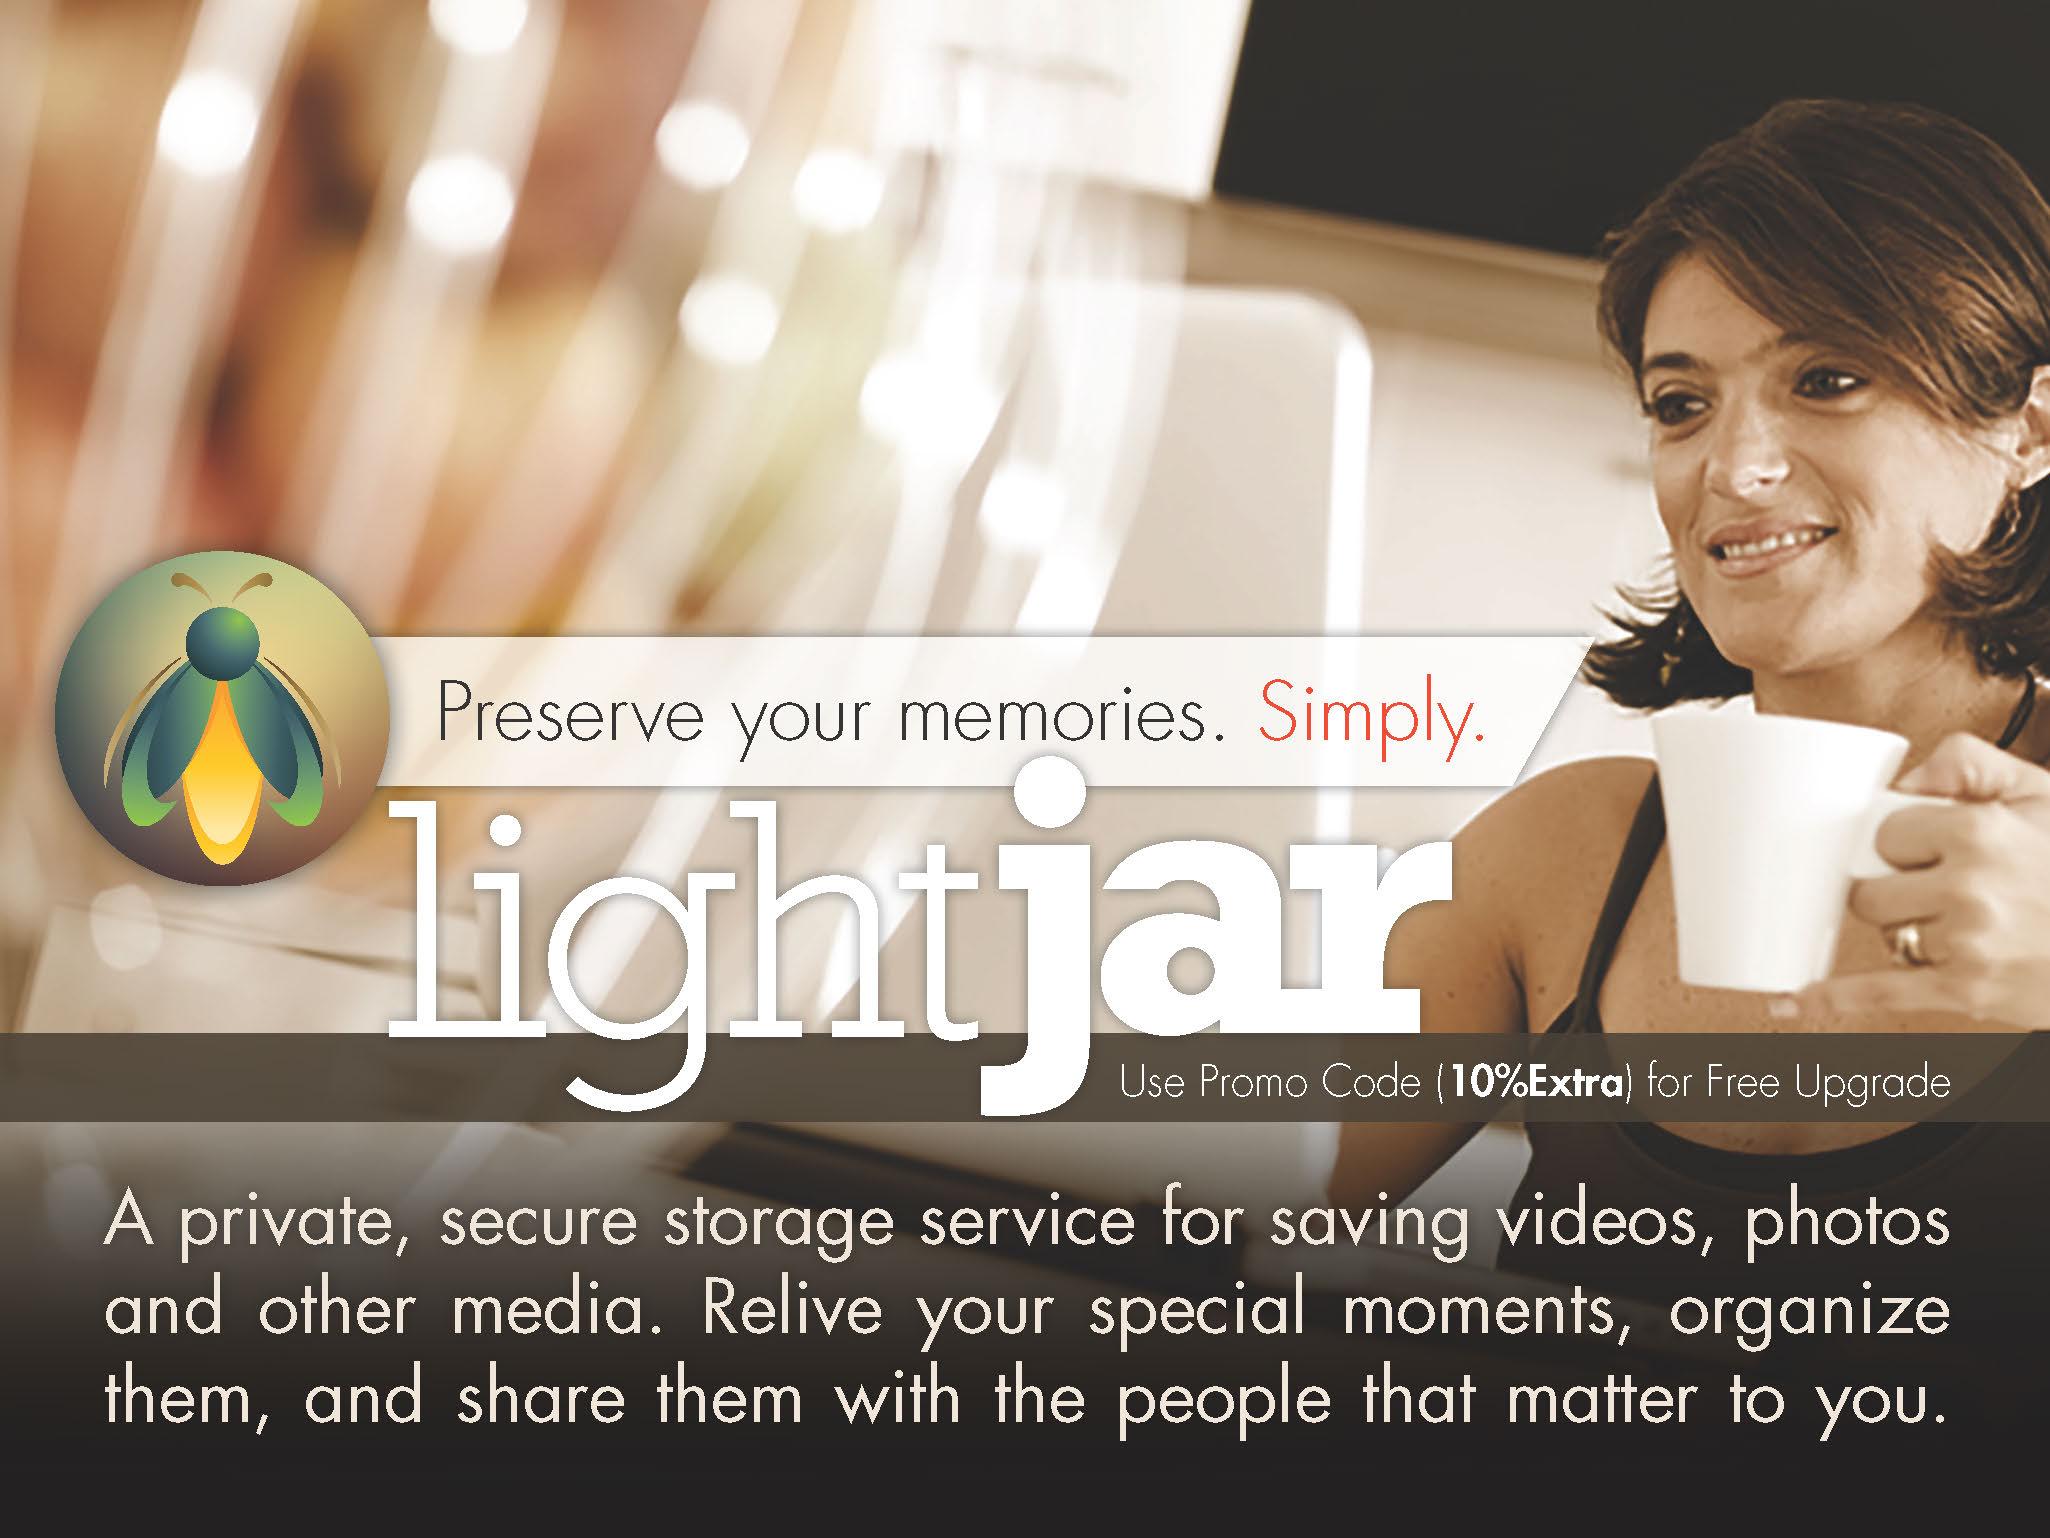 LightJar Postcard #5